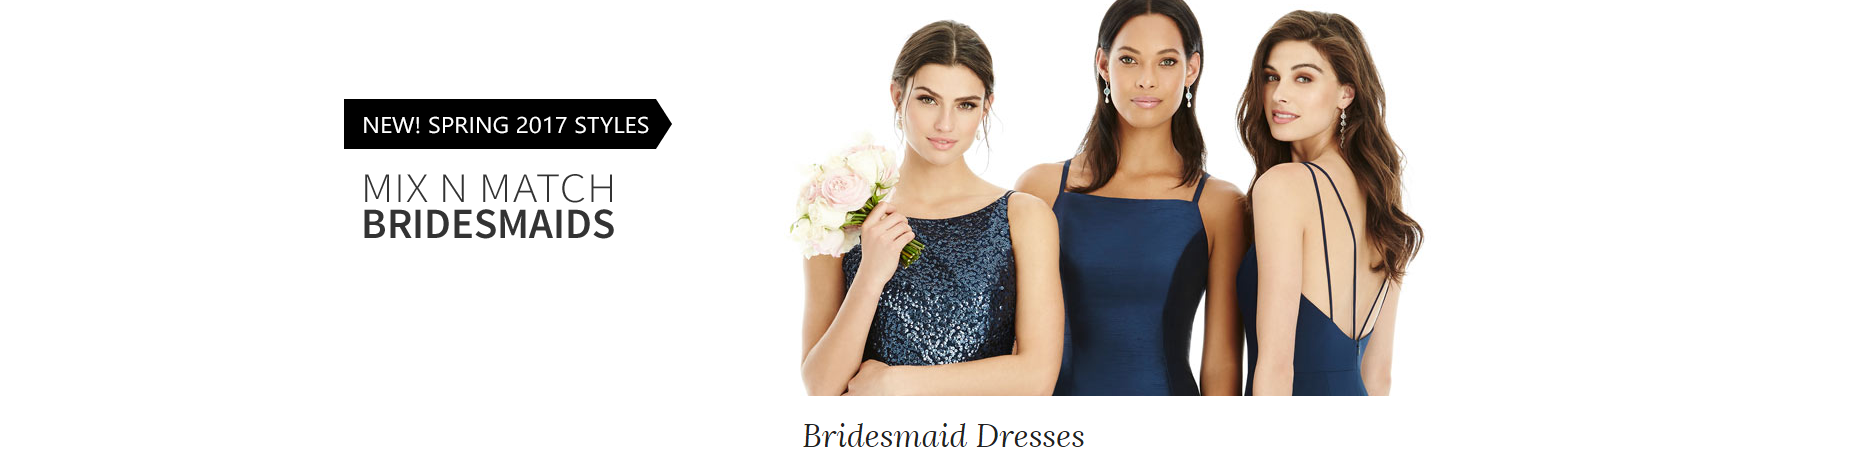 DESSY BRIDESMAIDS - AFTER SIX BRIDESMAIDS - ALFRED SUNG BRIDESMAIDS